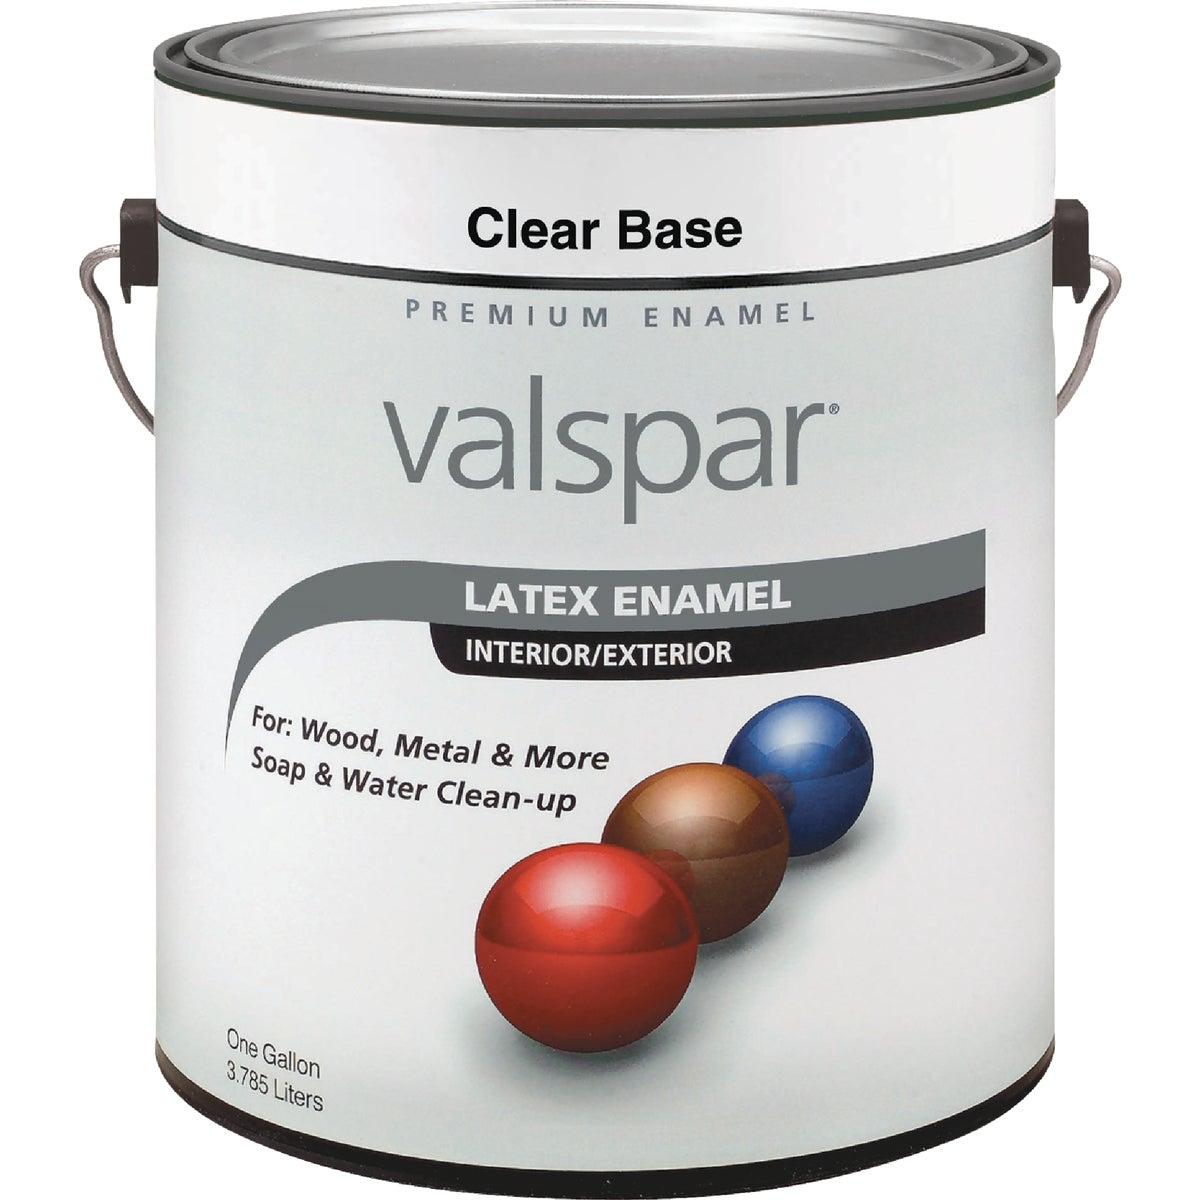 GLS LTX CLR BASE ENAMEL - 410.0065103.007 by Valspar Corp